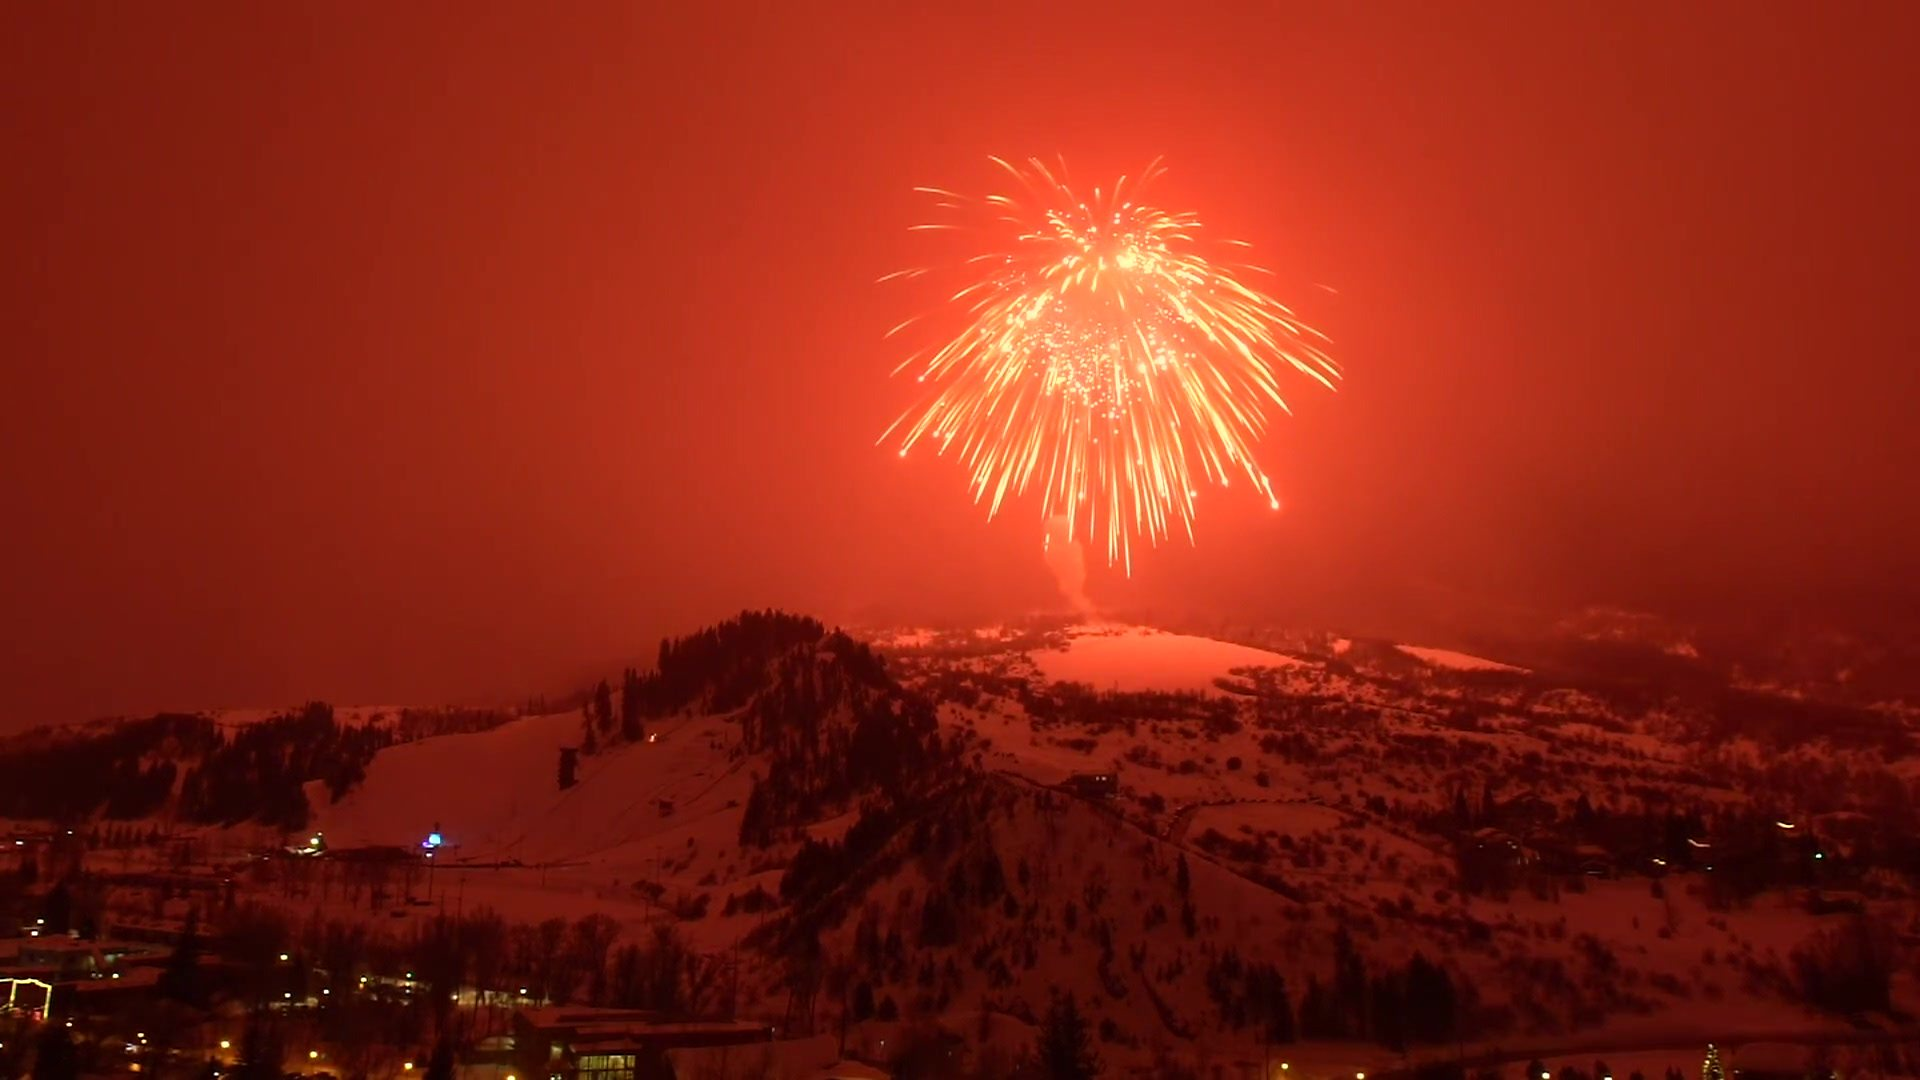 Covid: Fireworks fears over firebreak lockdown - BBC News